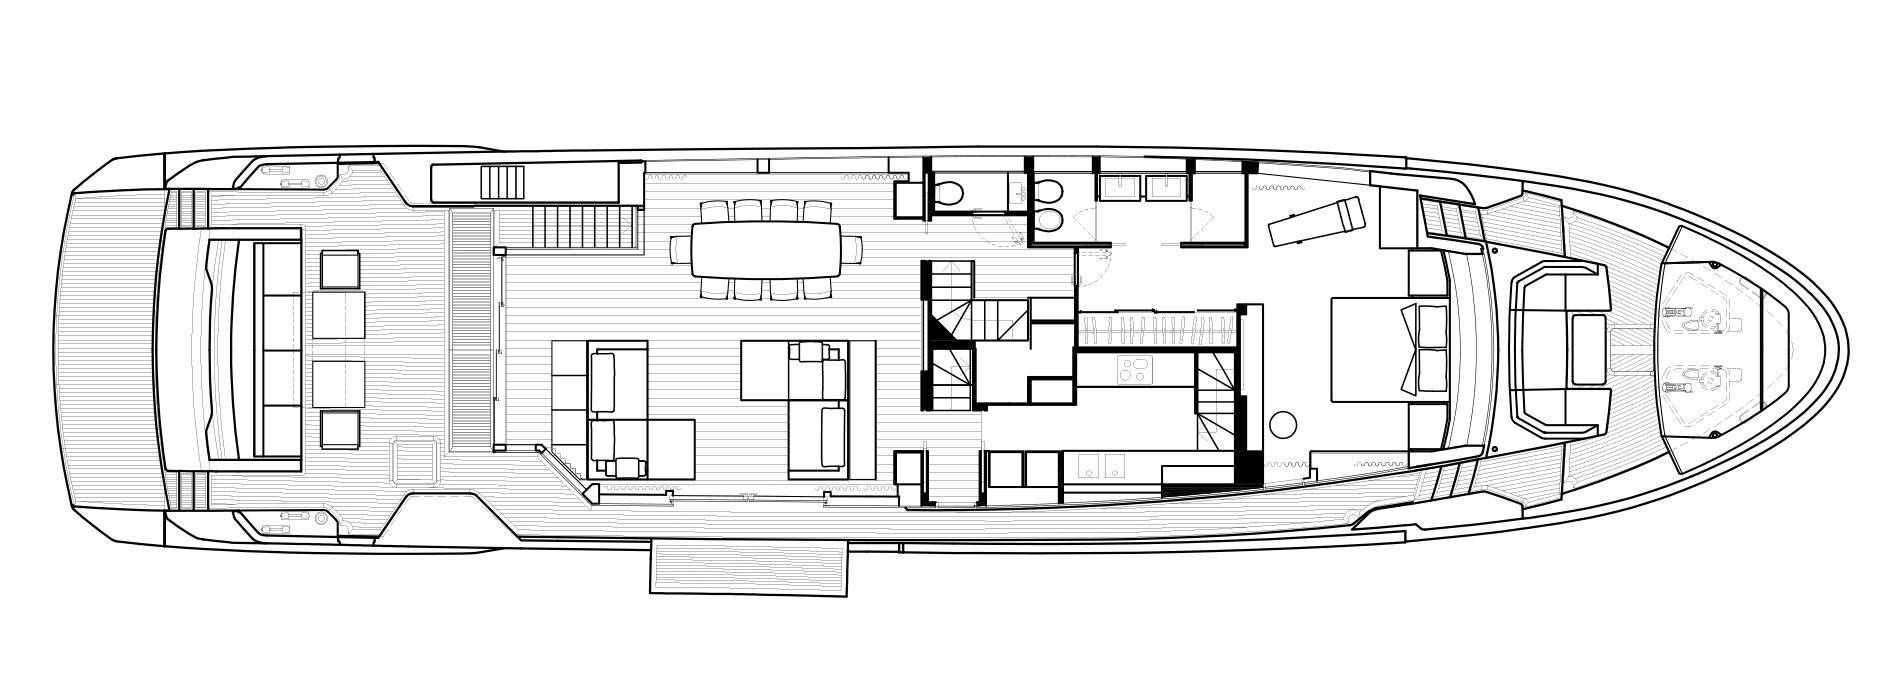 Sanlorenzo Yachts SL102 Главная палуба